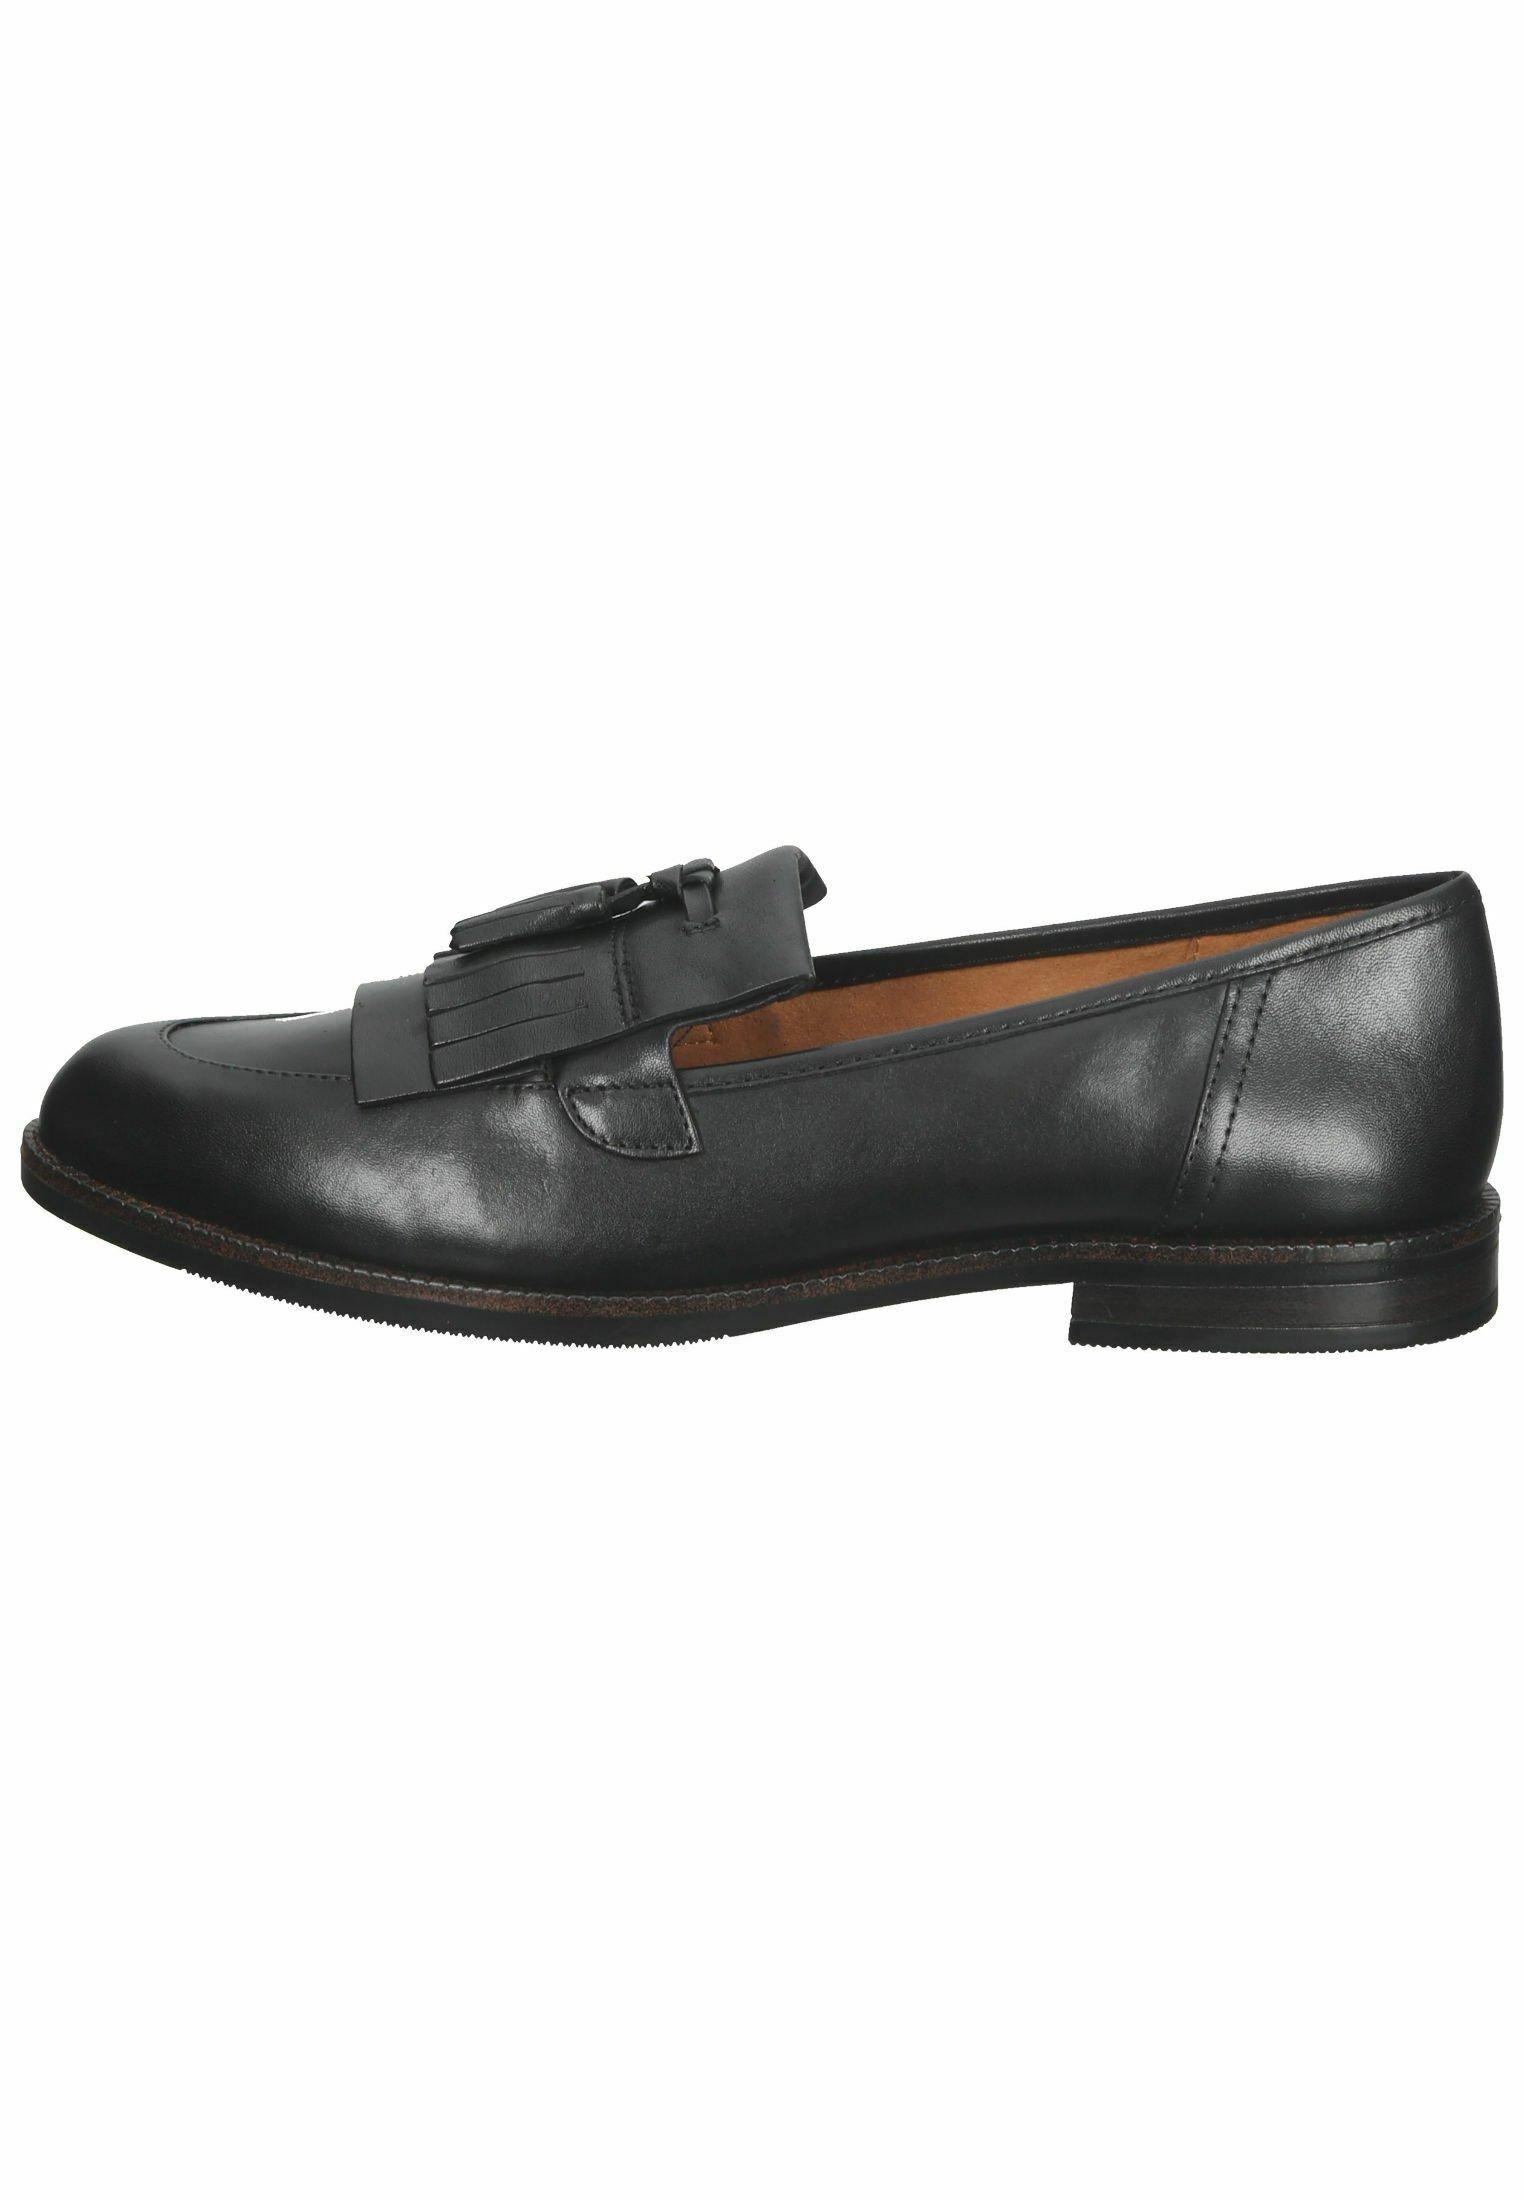 Damen Slipper - black nappa